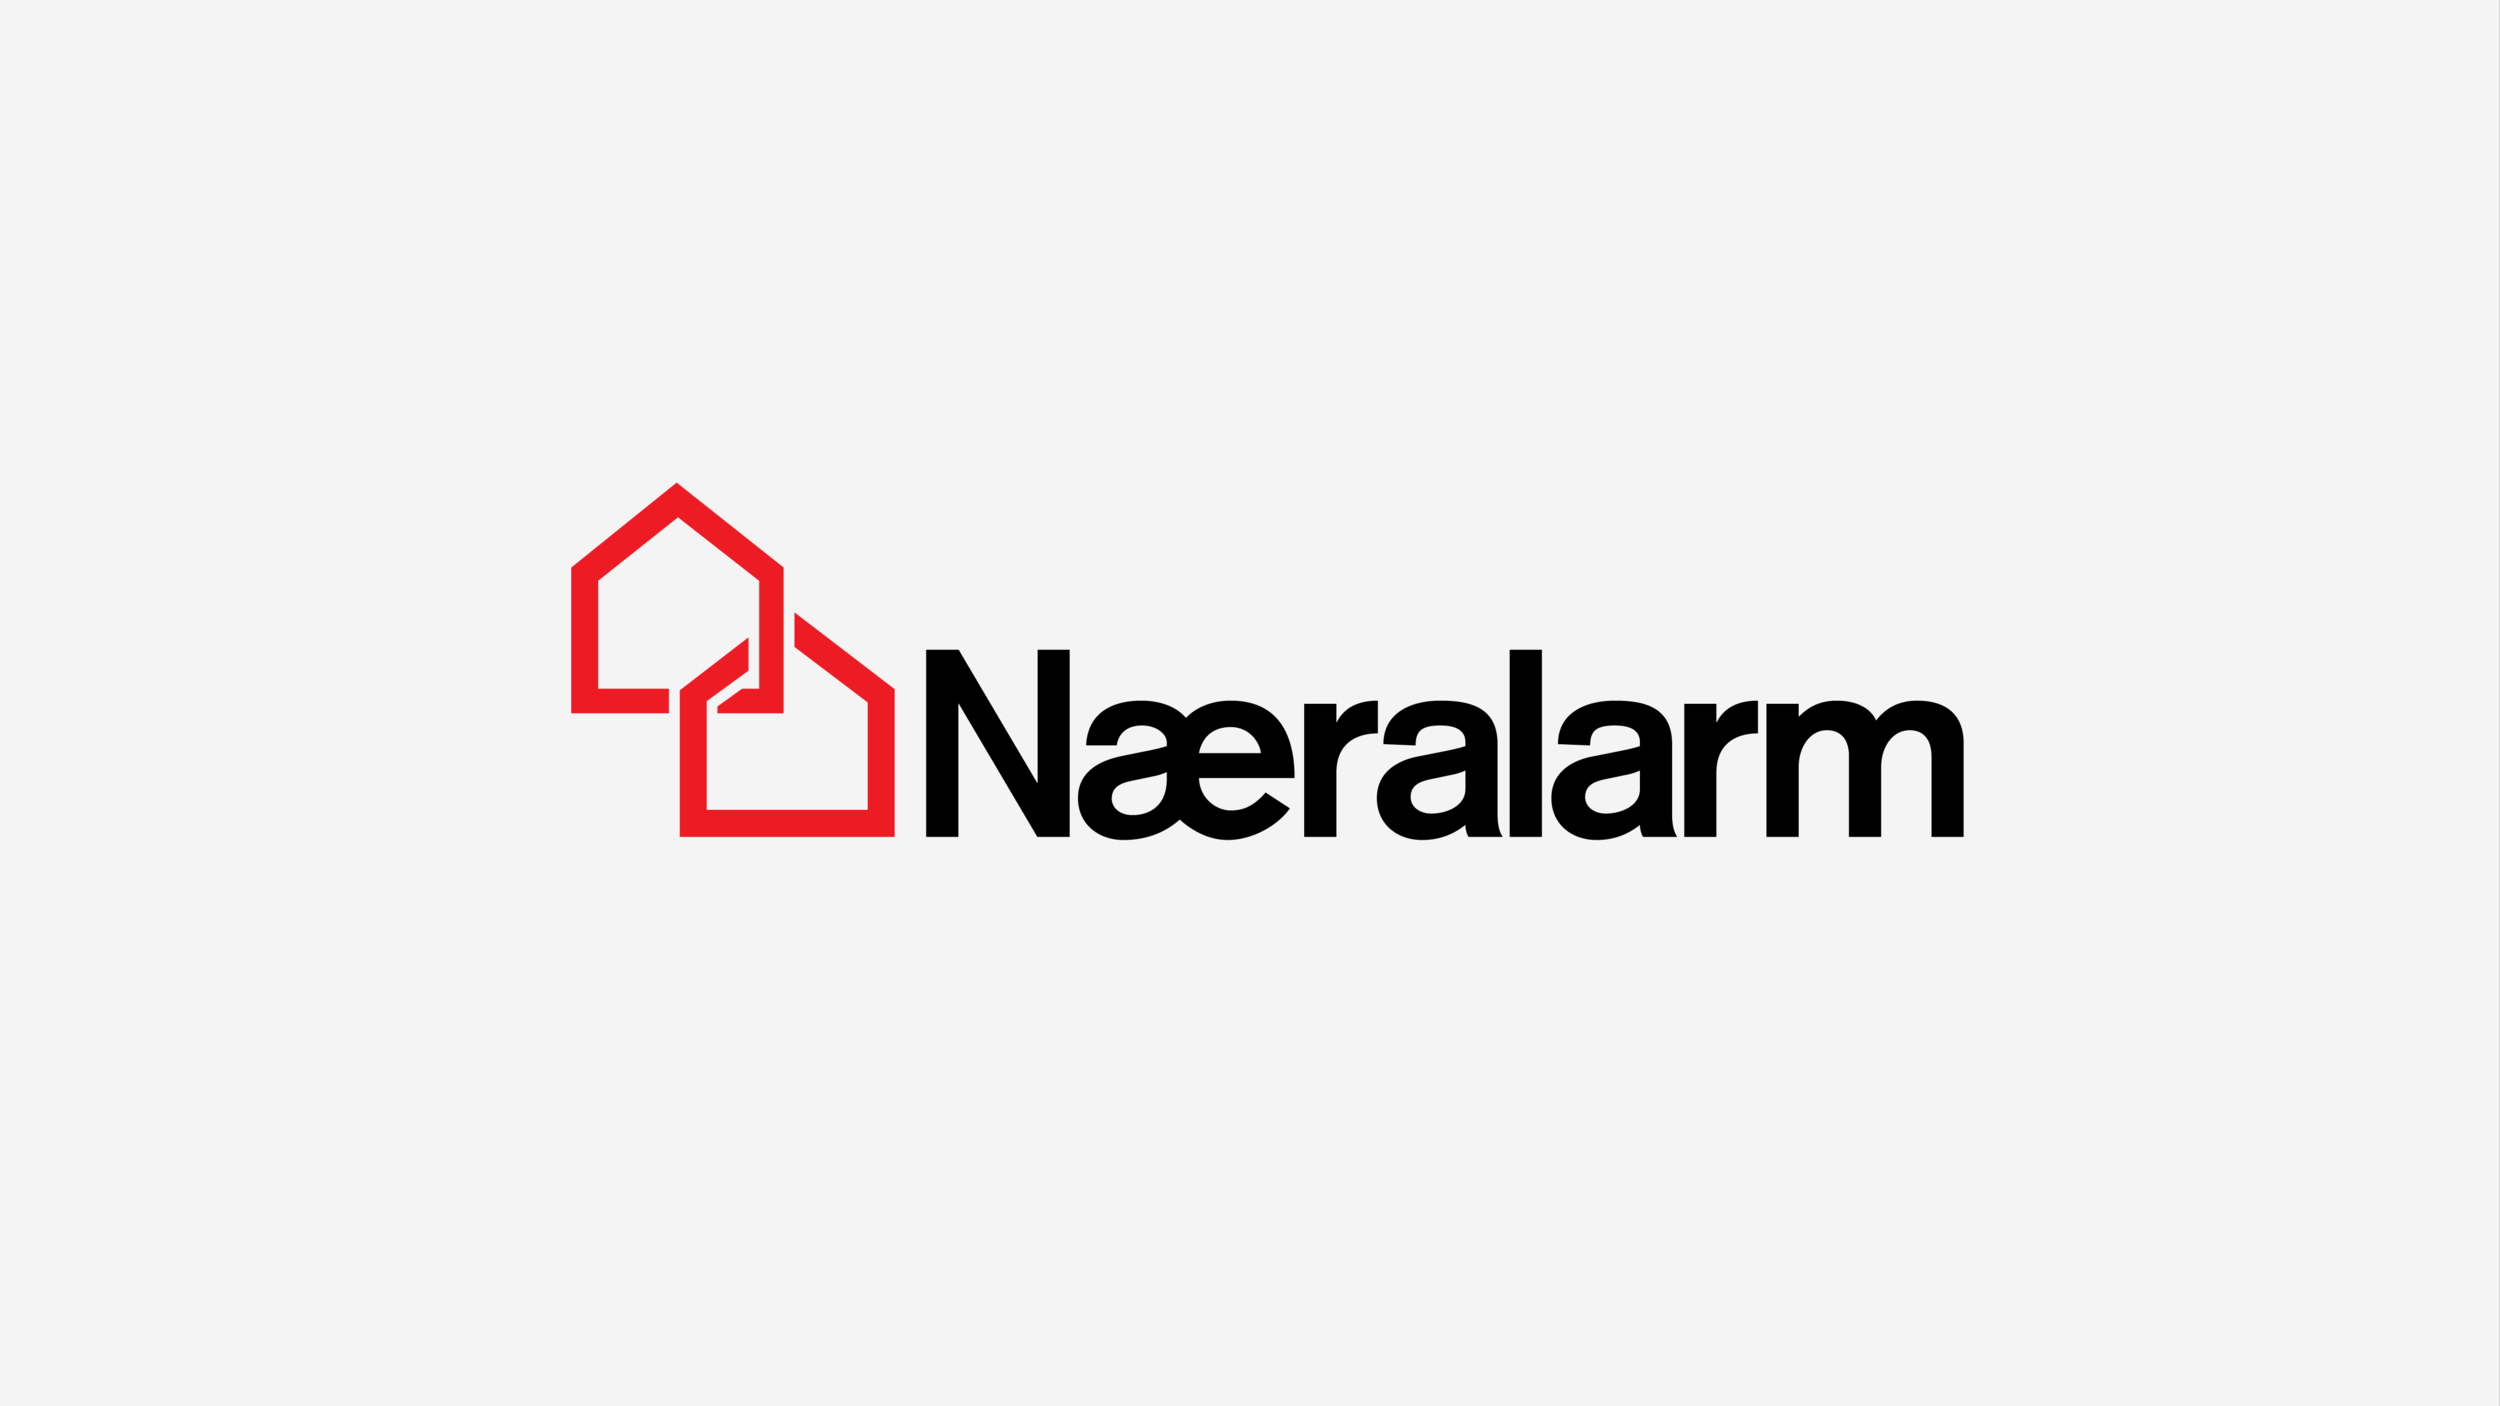 Næralarm_logo.png